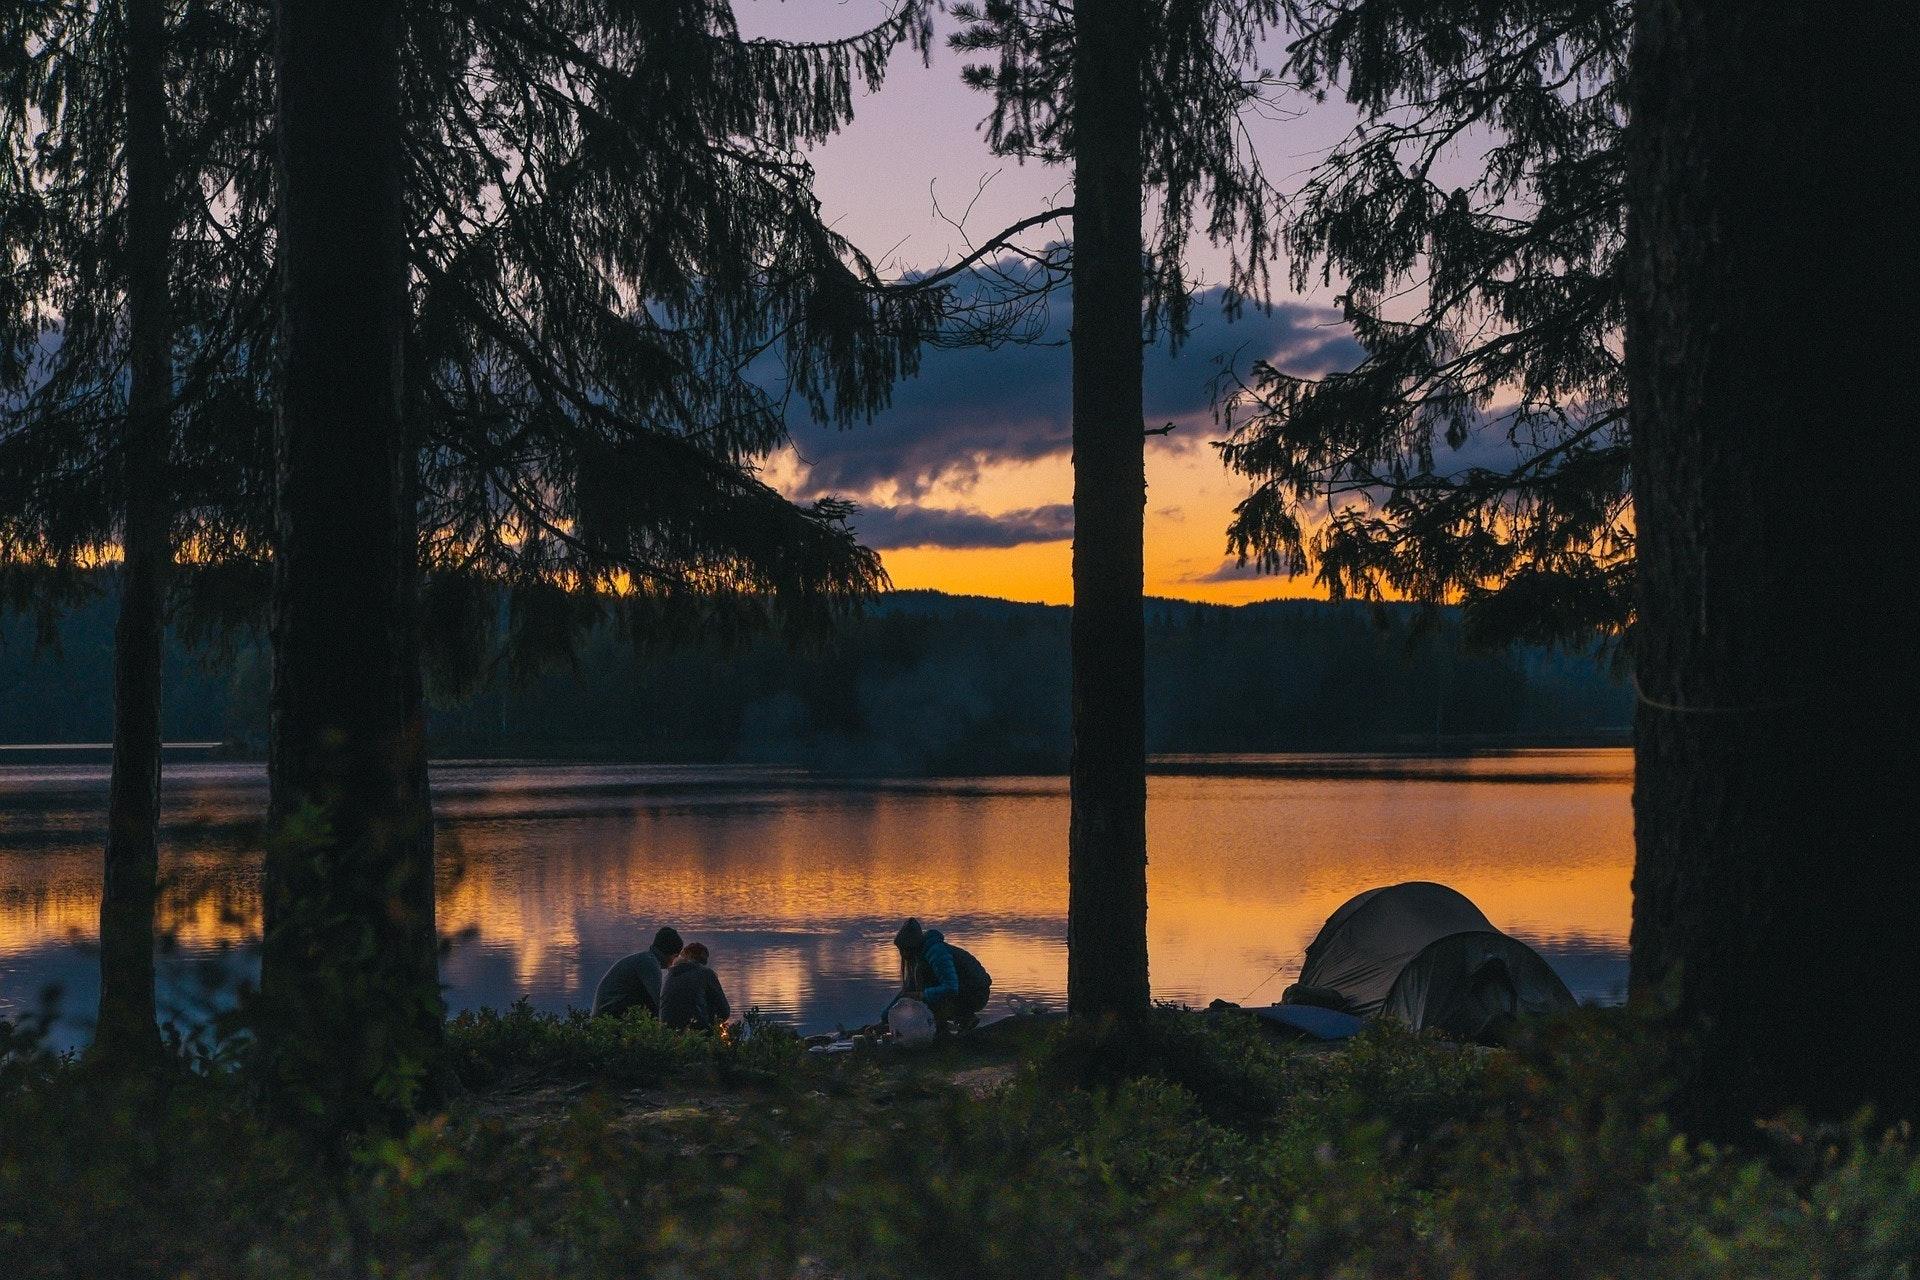 Camping 984038 1920  1 .jpg?ixlib=rails 2.1